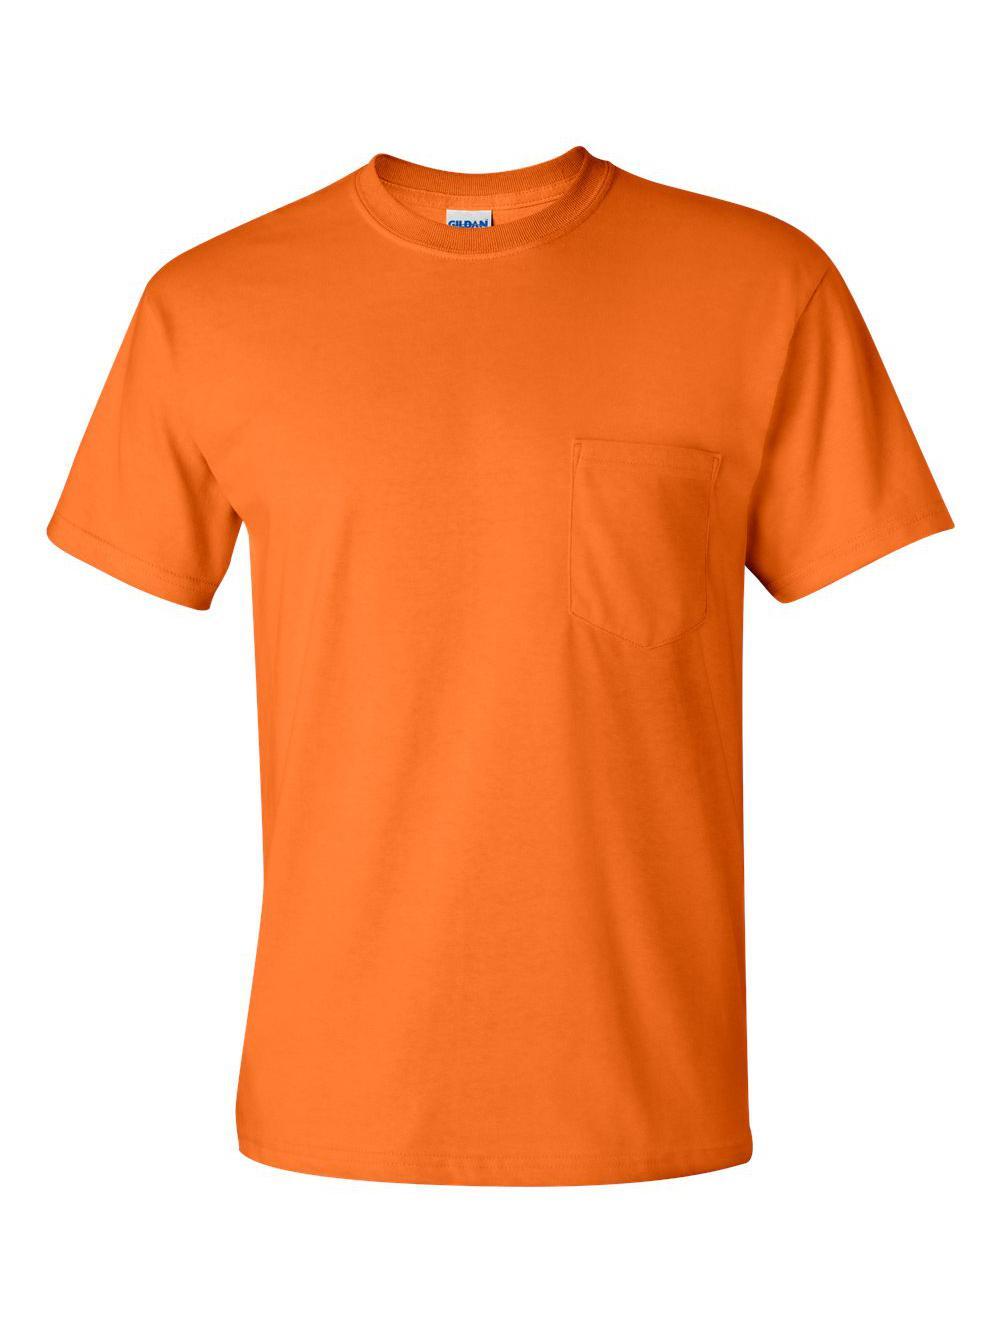 Gildan-Ultra-Cotton-T-Shirt-with-a-Pocket-2300 thumbnail 36